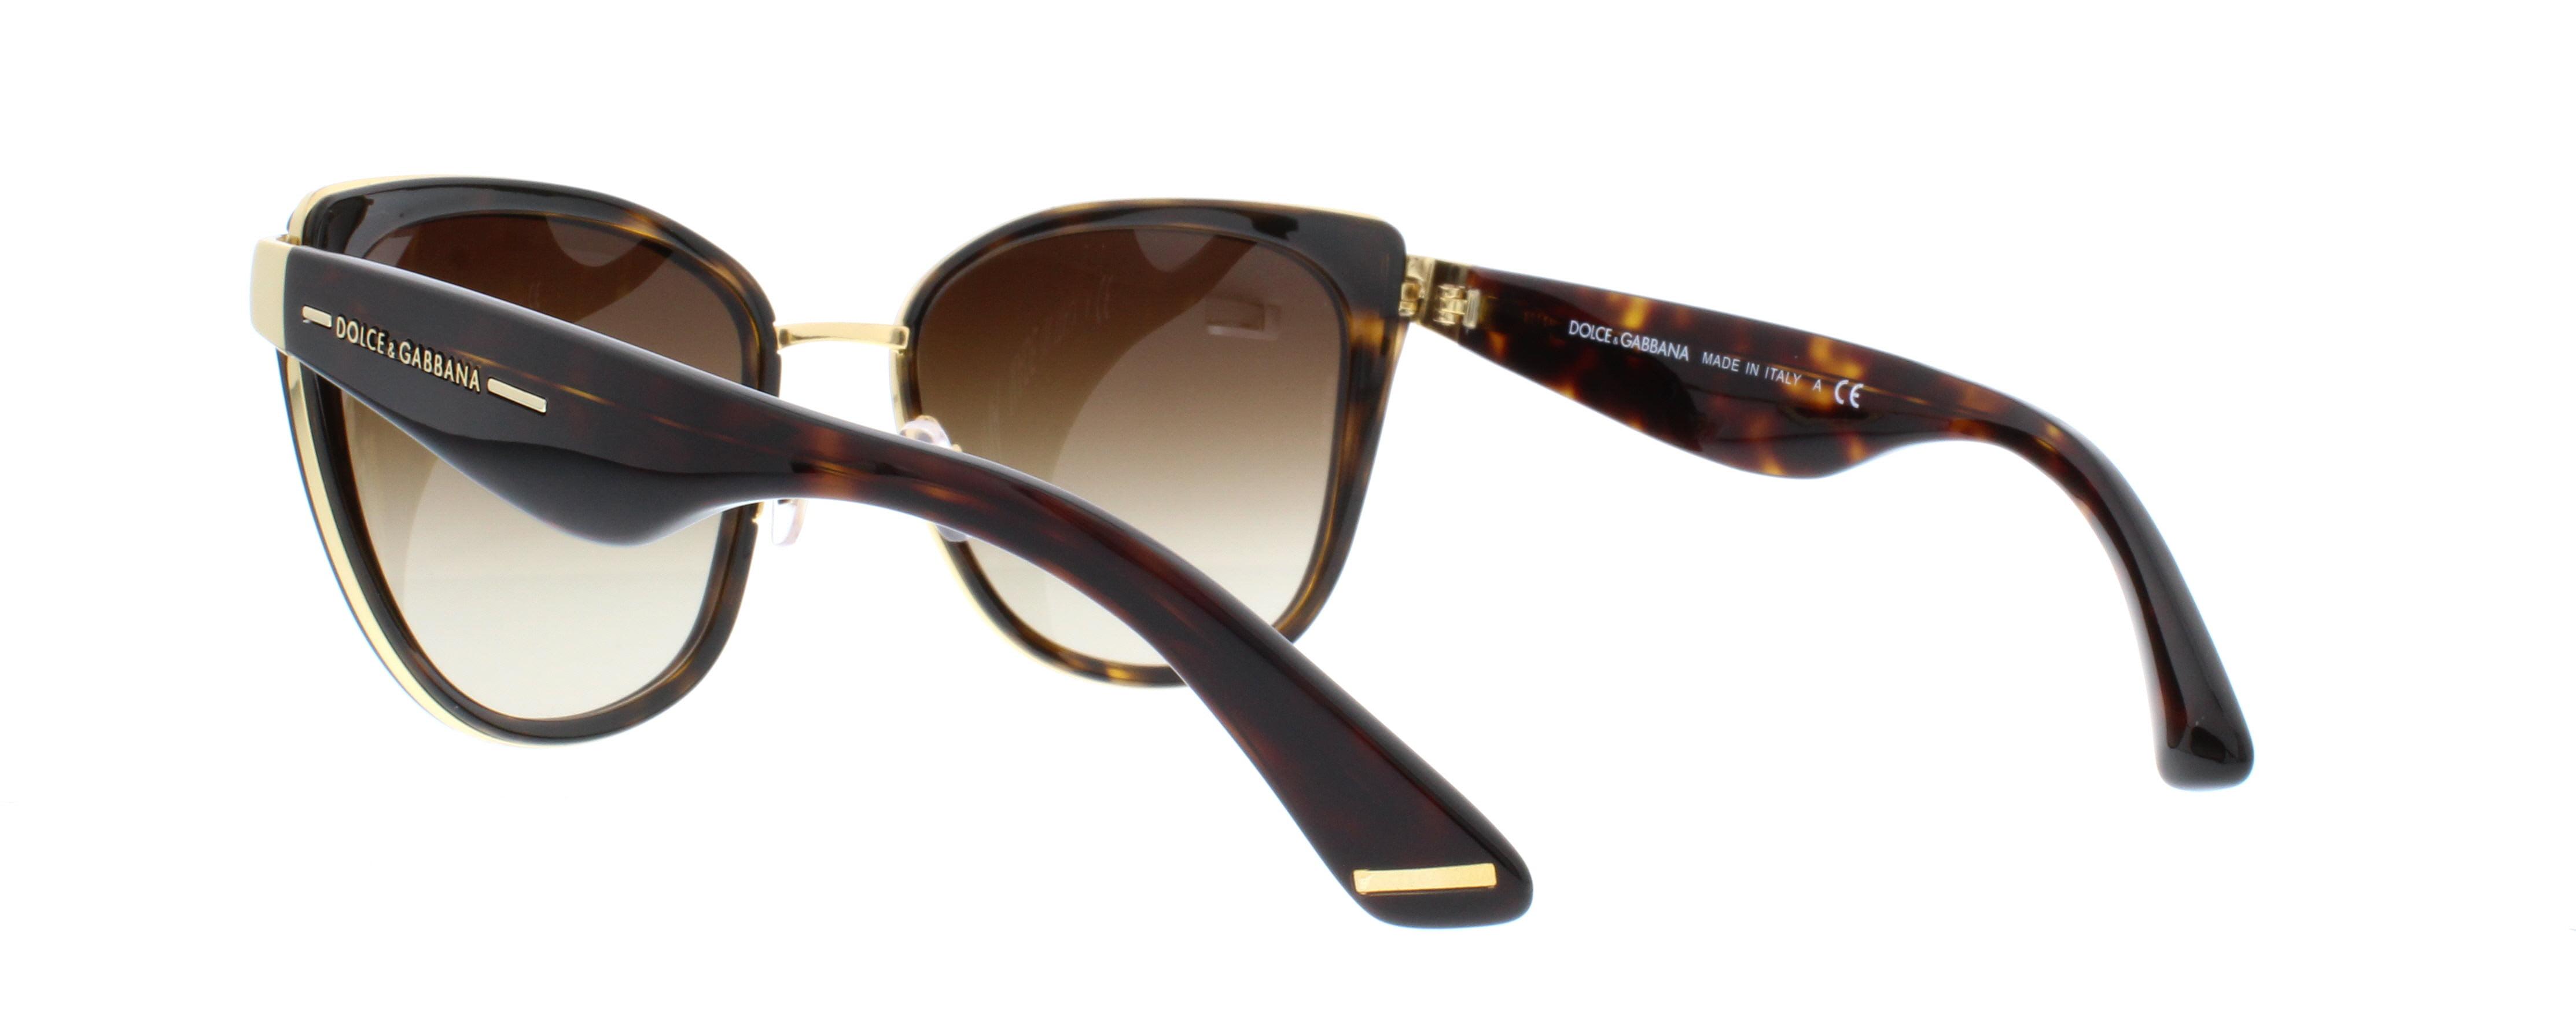 31bae81b4baa Dolce   Gabbana - Gradient DG2107-02 13-57 Brown Butterfly Sunglasses -  Walmart.com